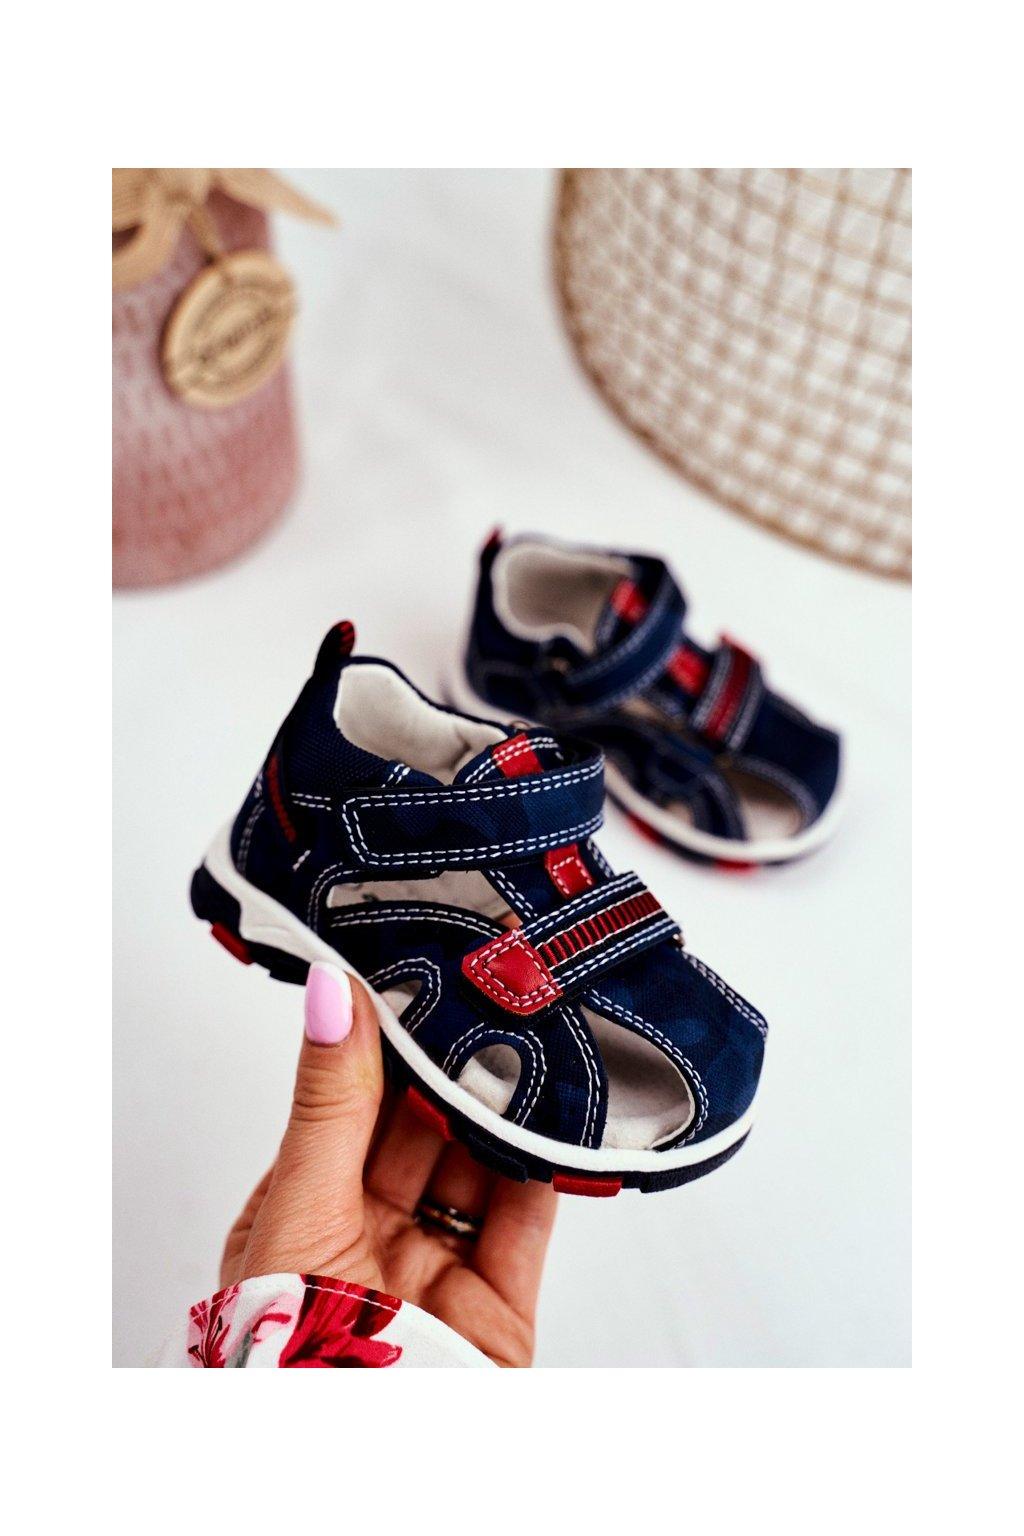 Detské Sandále se suchým zipem tmavo modre Goreno NJSK JX18